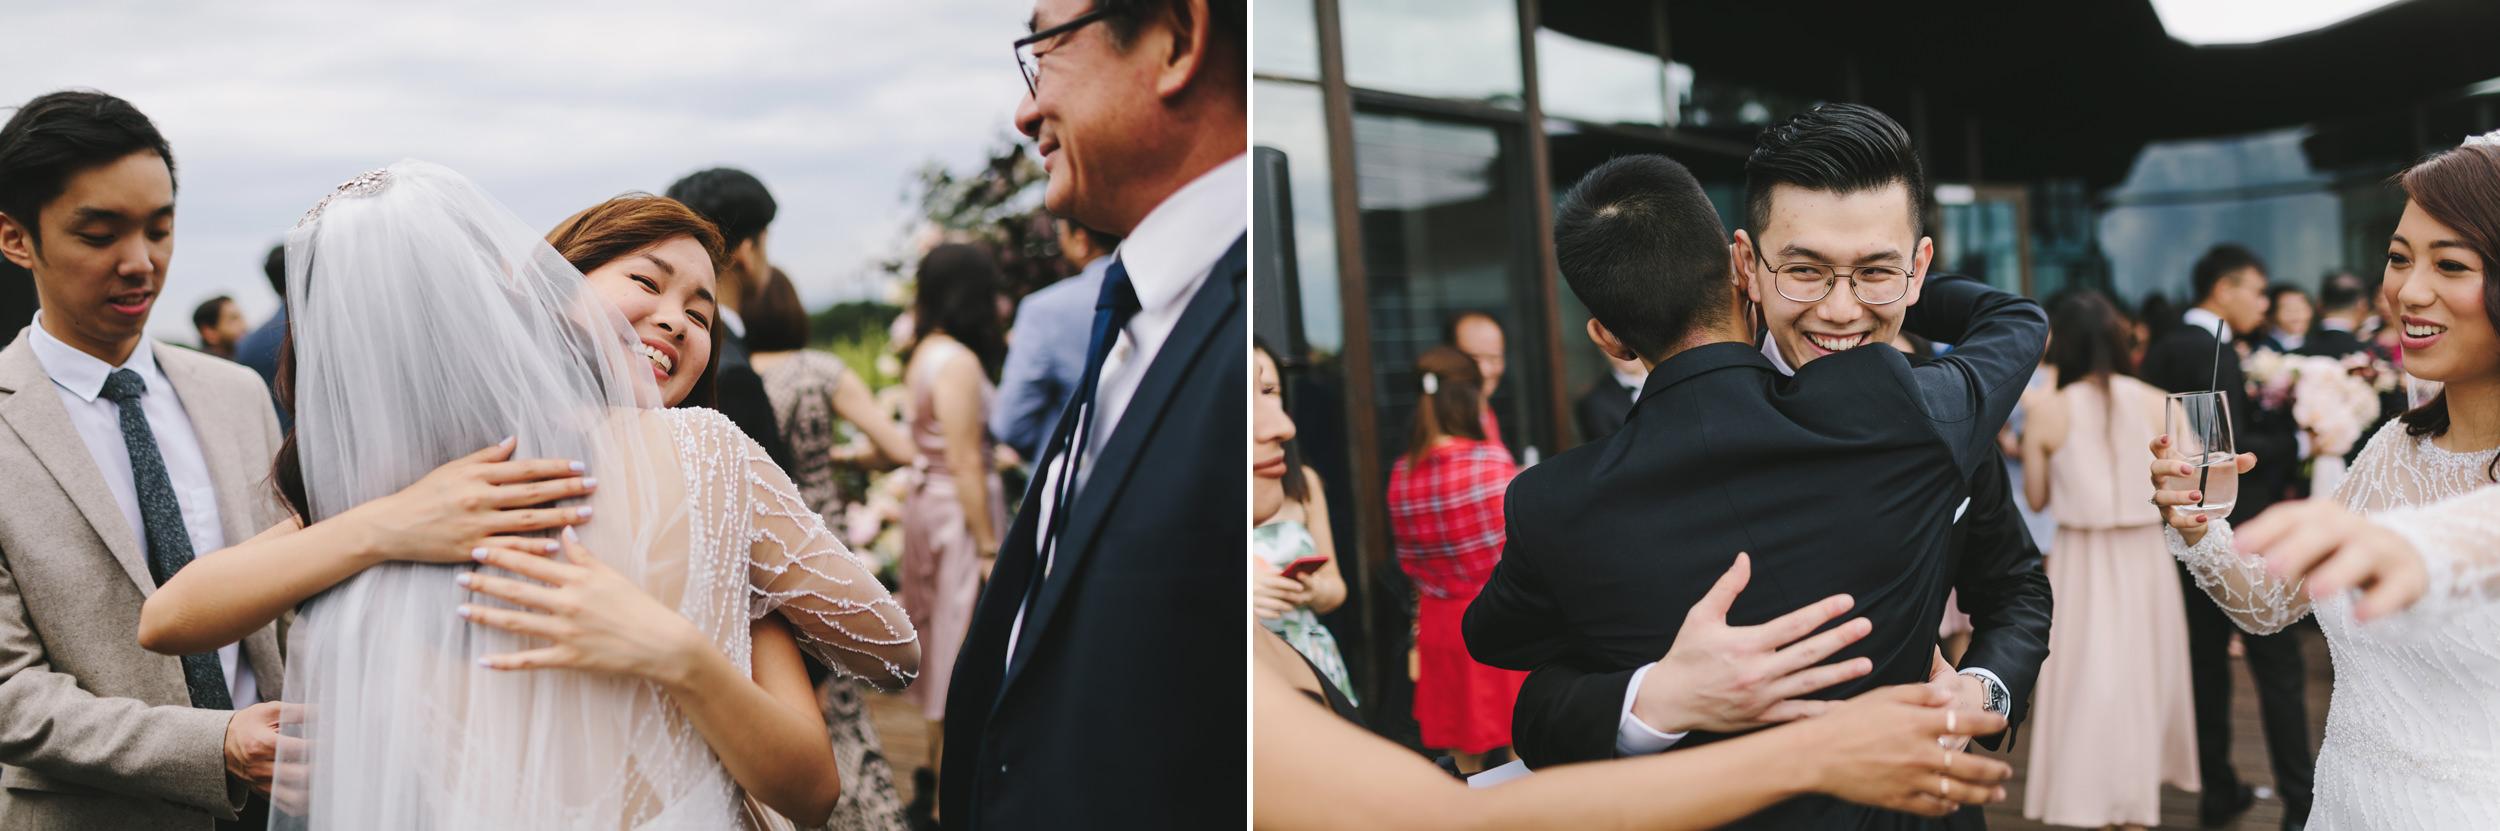 Melbourne Winery Wedding Daryl & Adeline 53.JPG